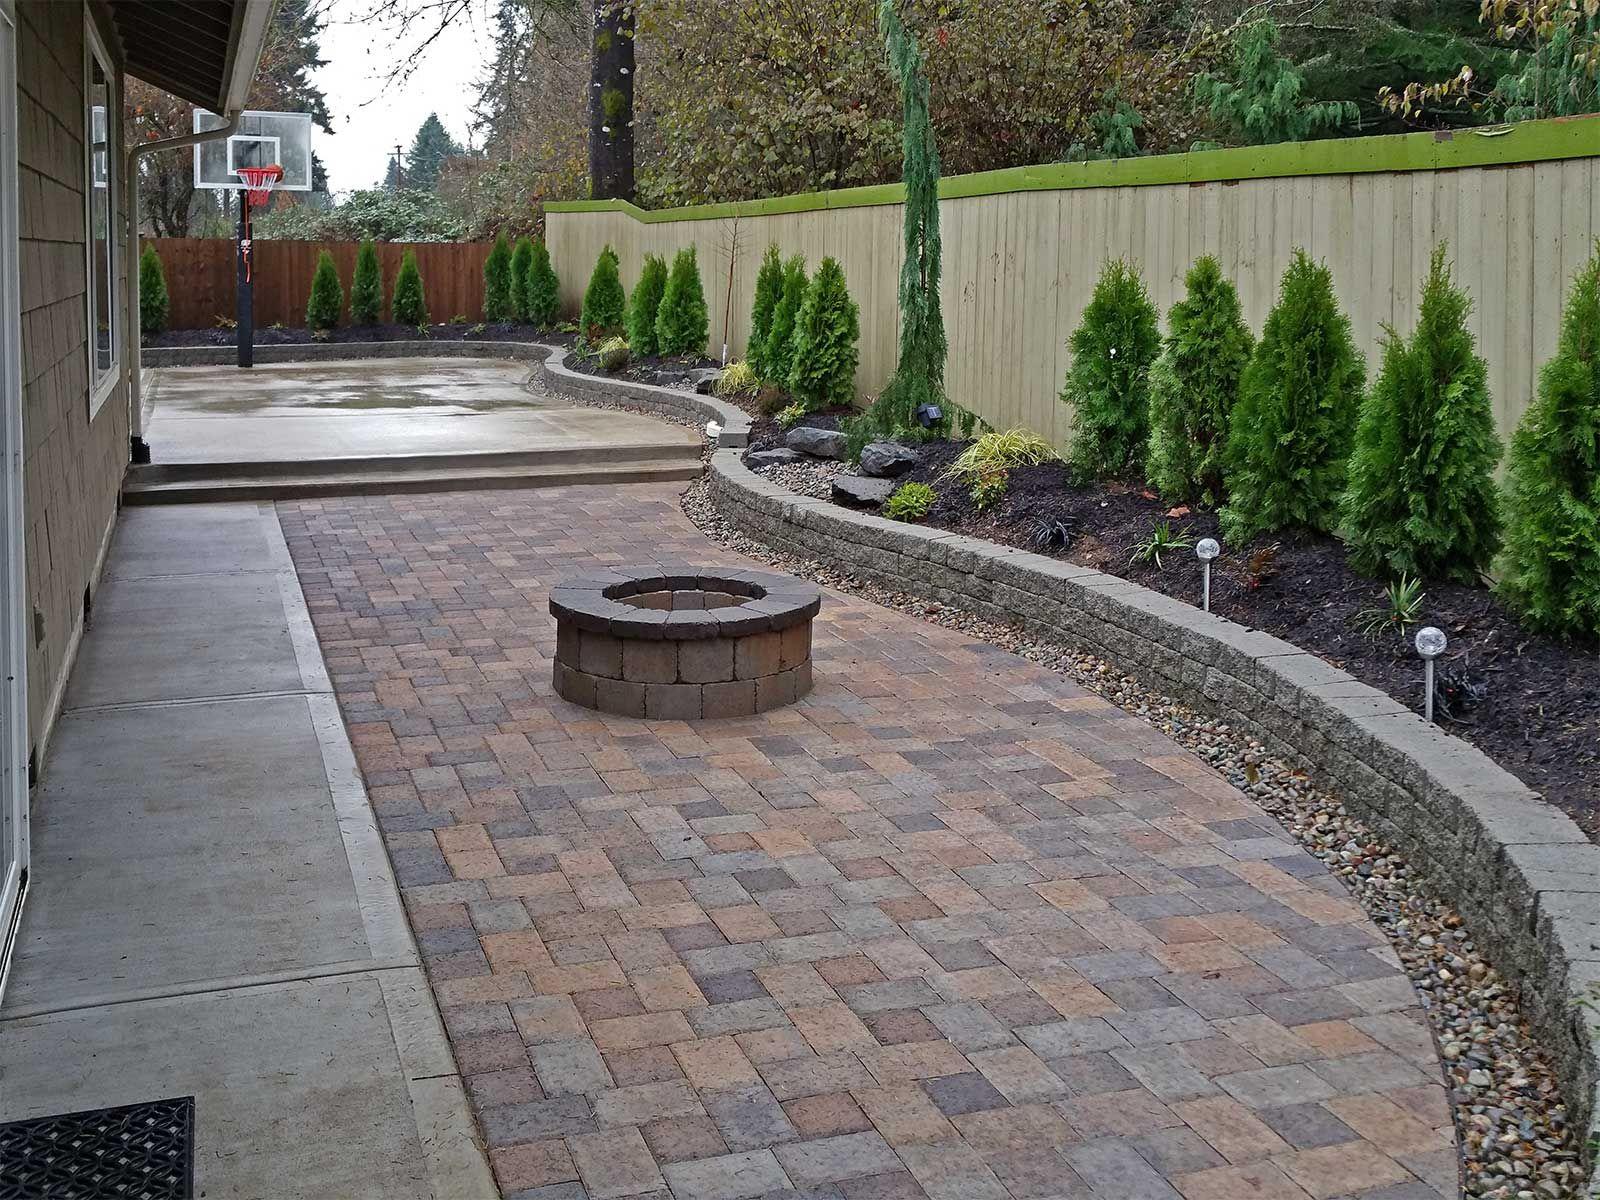 Backyard Paver Patio Connected To A Concrete Slab